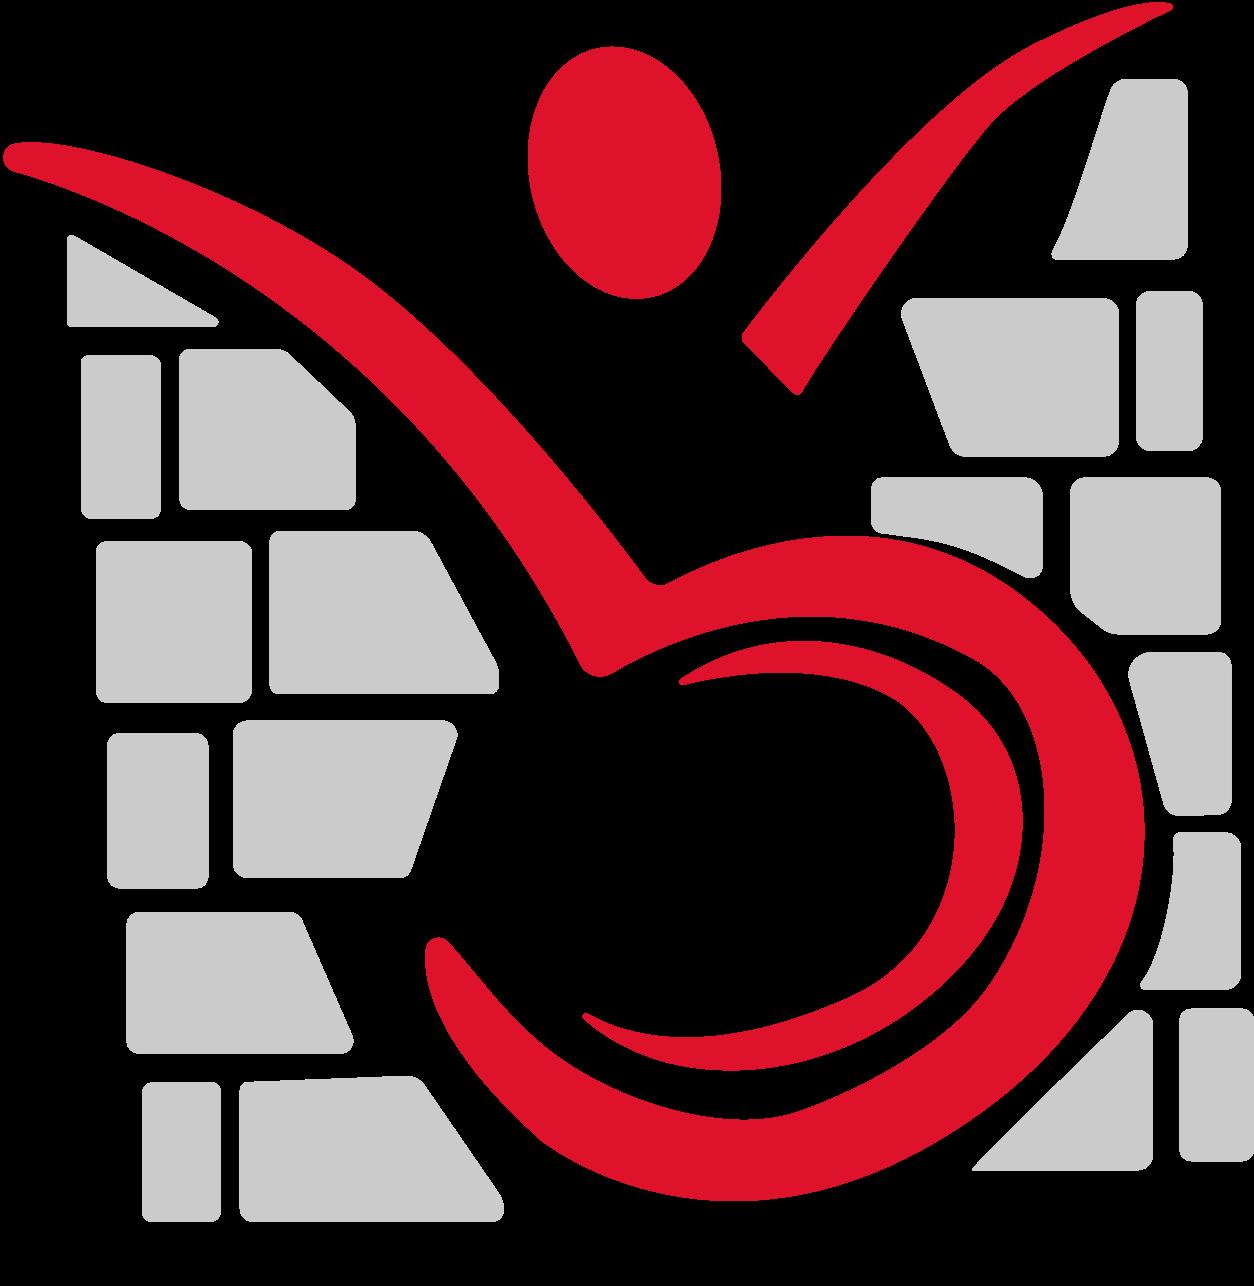 1541675959944438 handy superabile logo ufficiale 1